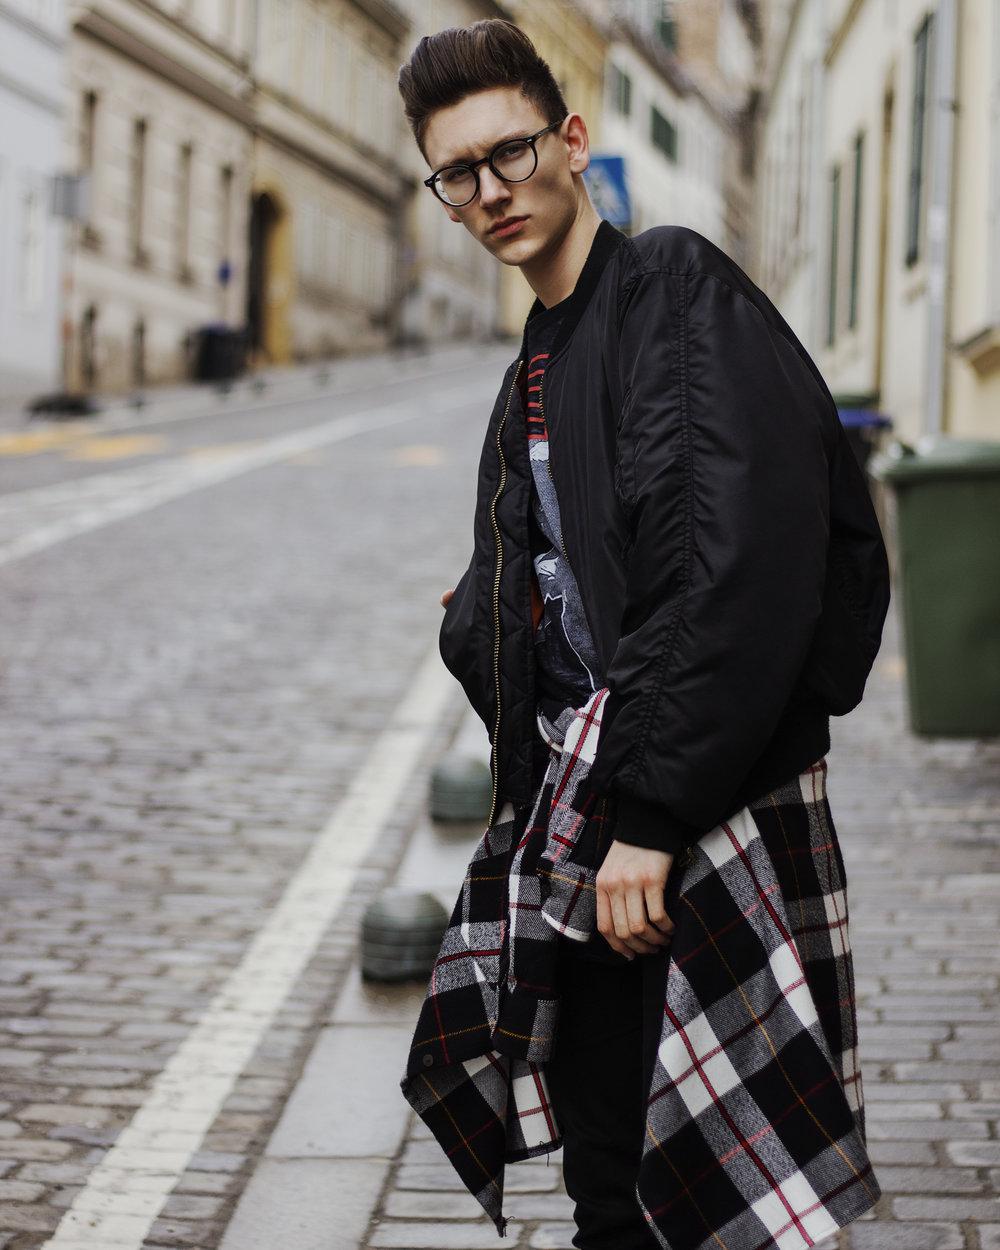 expensive-reality-luka-lajic-croatia-mens-fashion-yeezy-2018-blogger (2).jpg